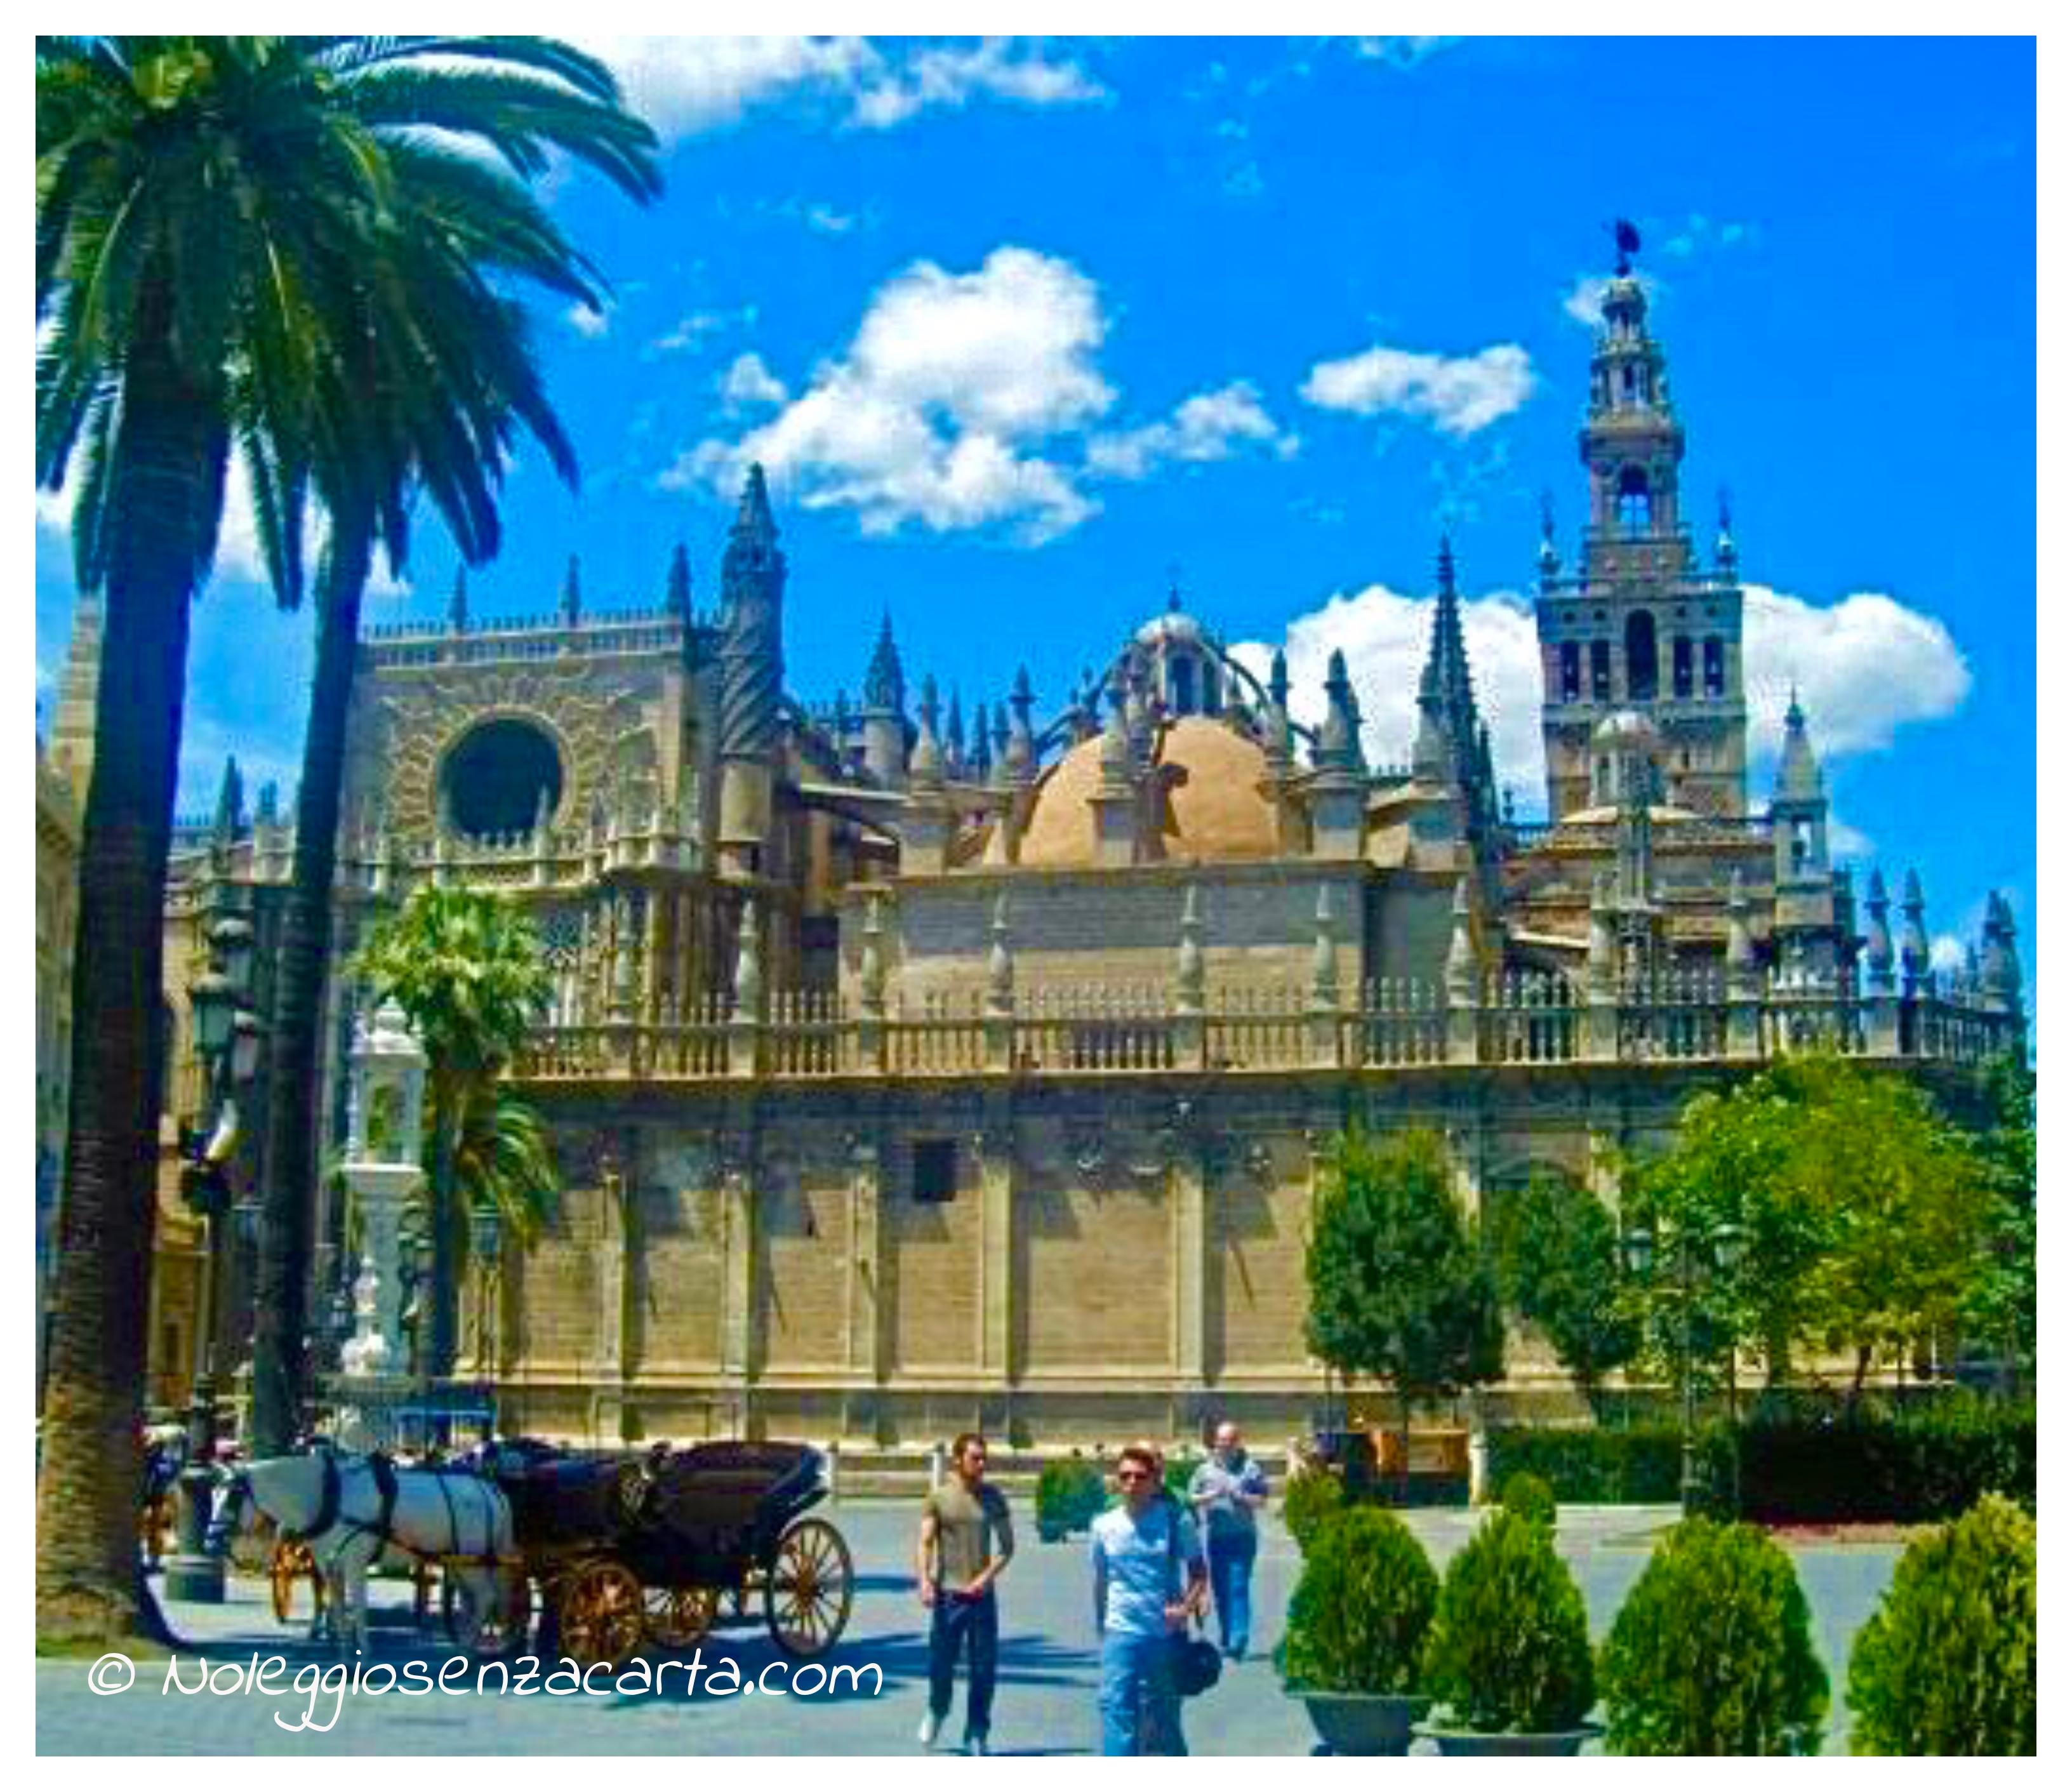 Alquiler coche Sevilla sin tarjeta de crédito